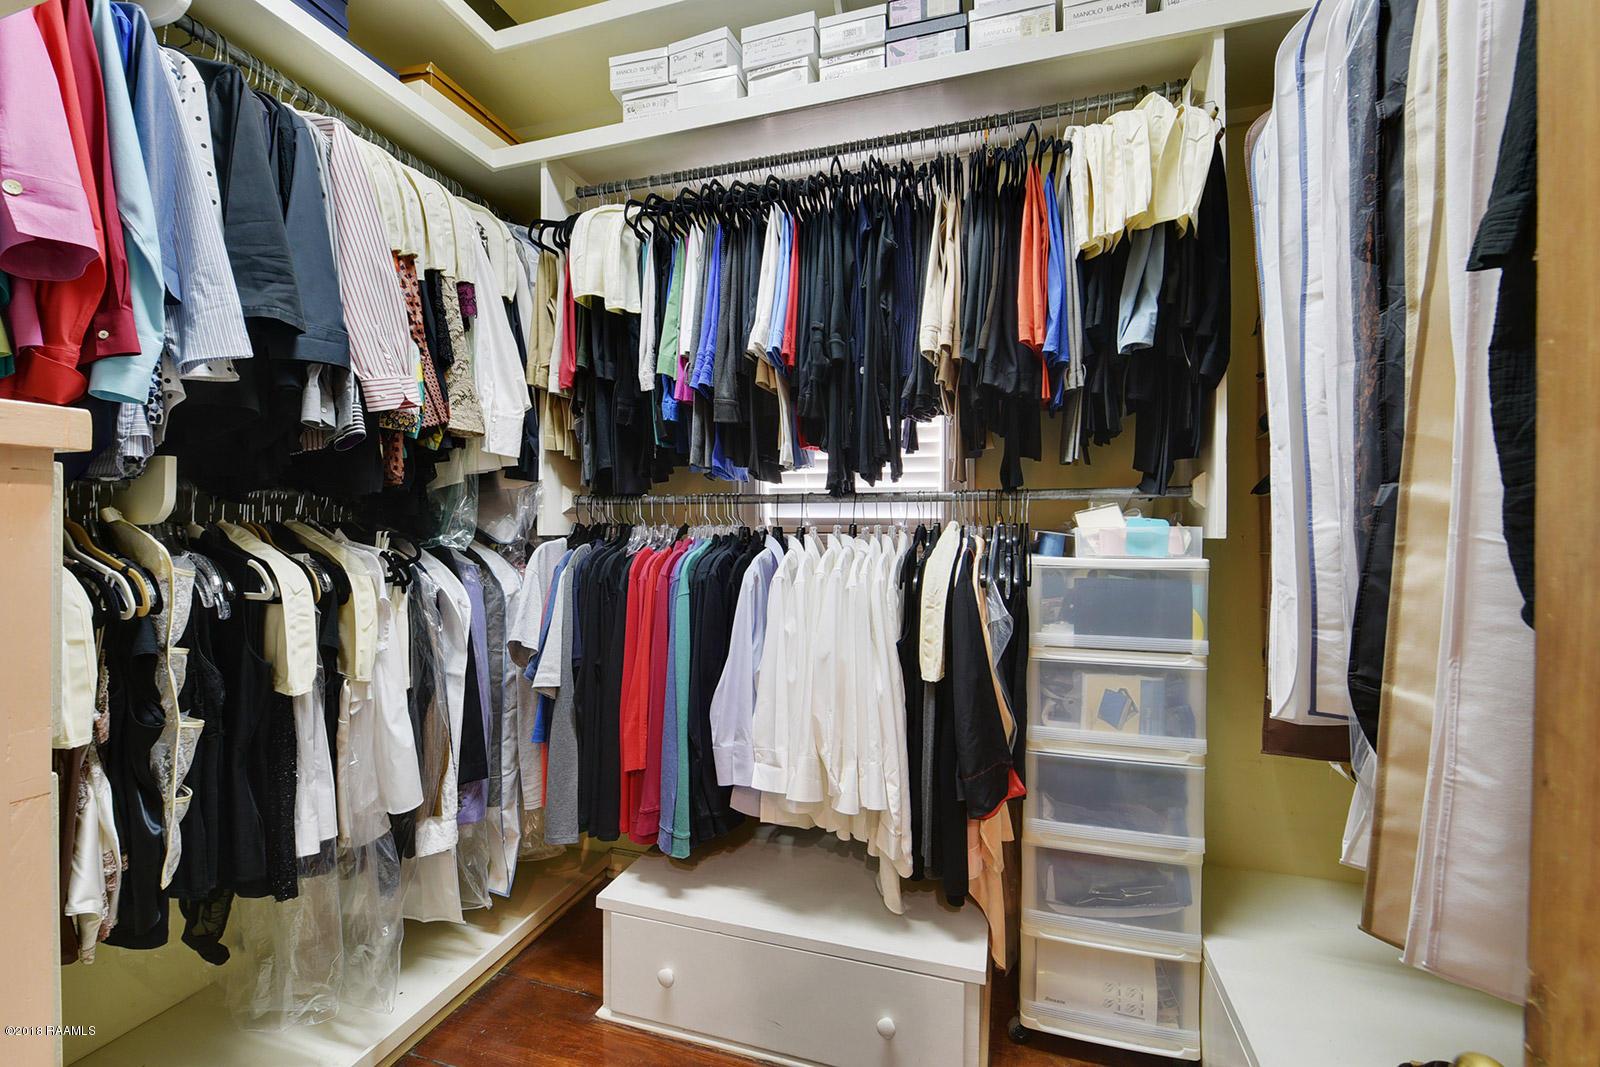 2900 The Pines Street, Opelousas, LA 70570 Photo #29